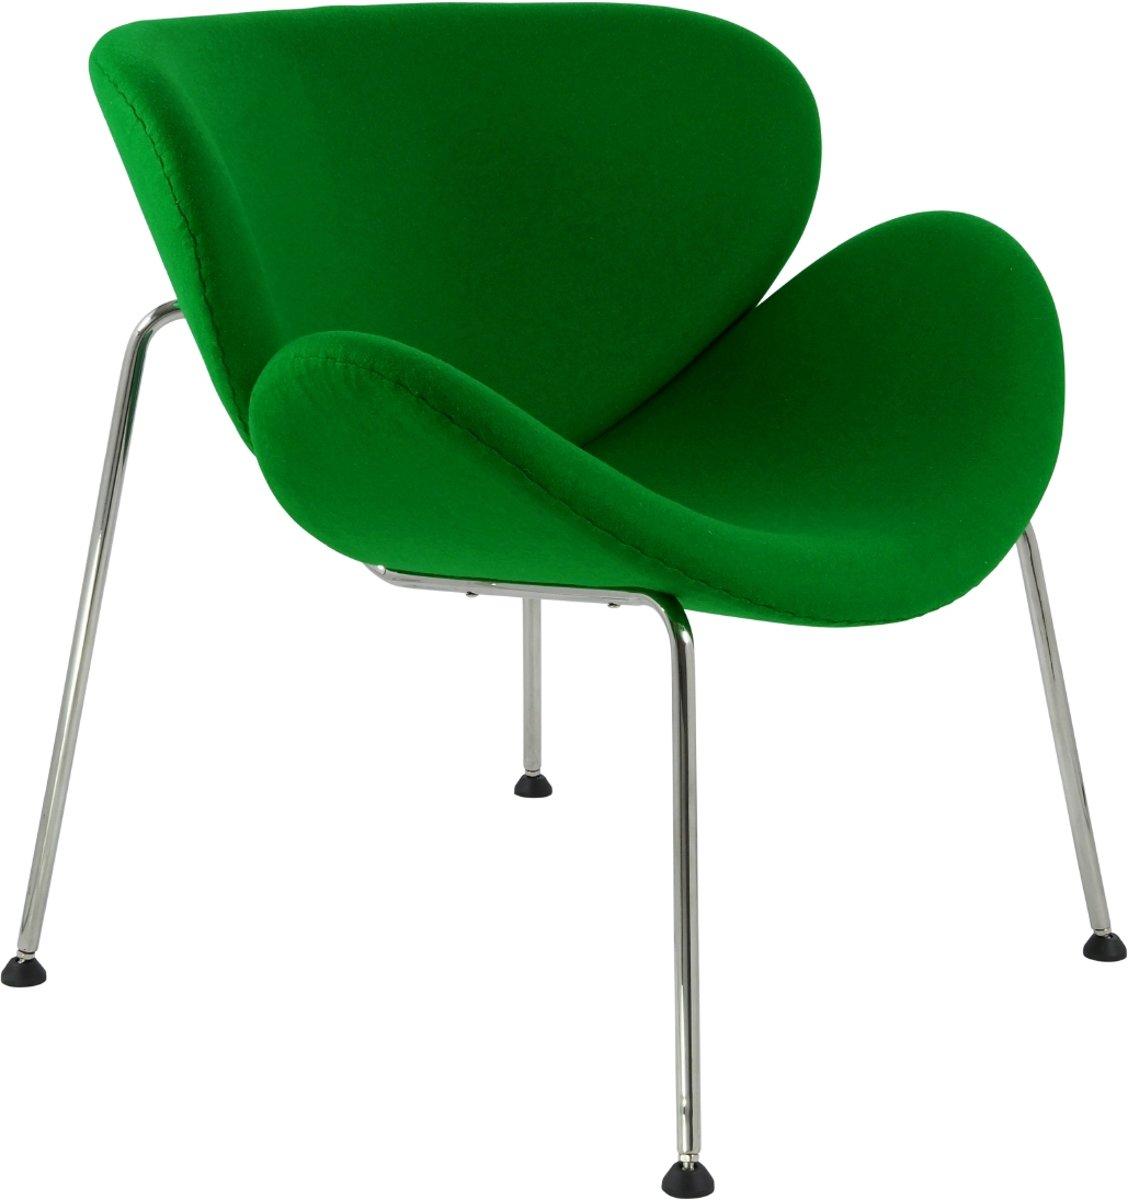 lounge stoel Orange slice originele grootte groen kopen